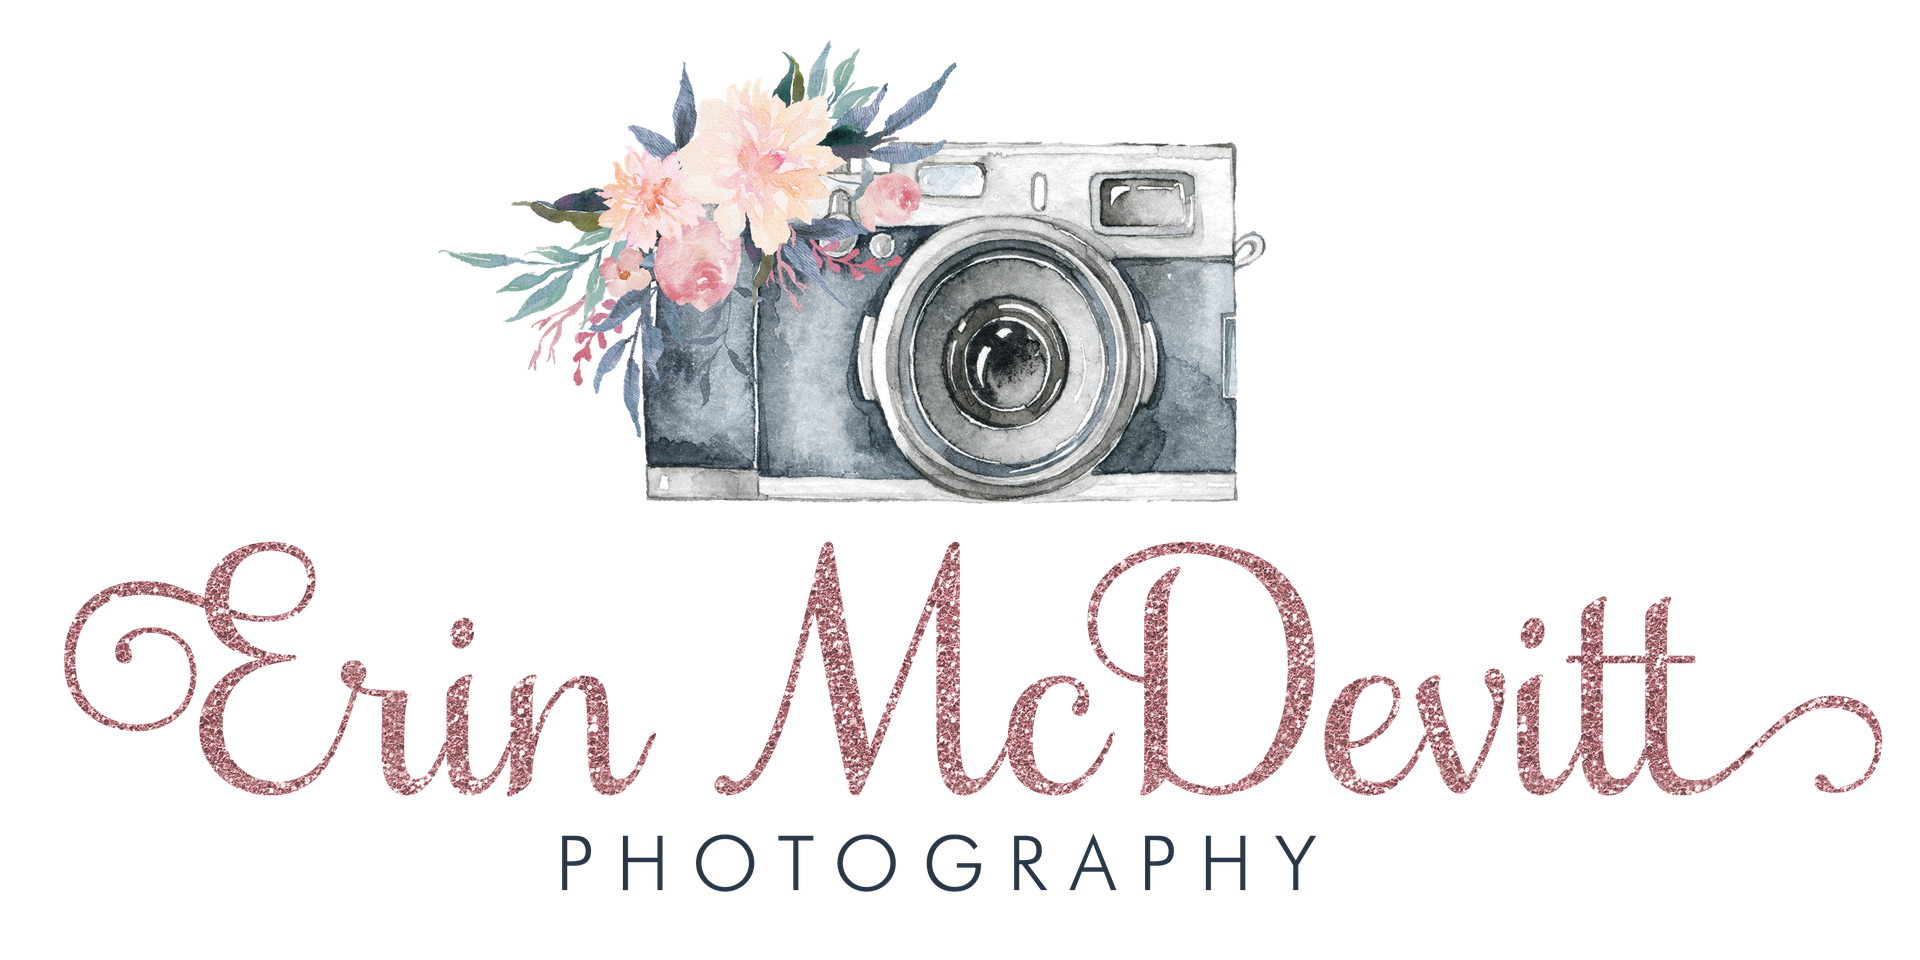 Erin McDevitt Photography